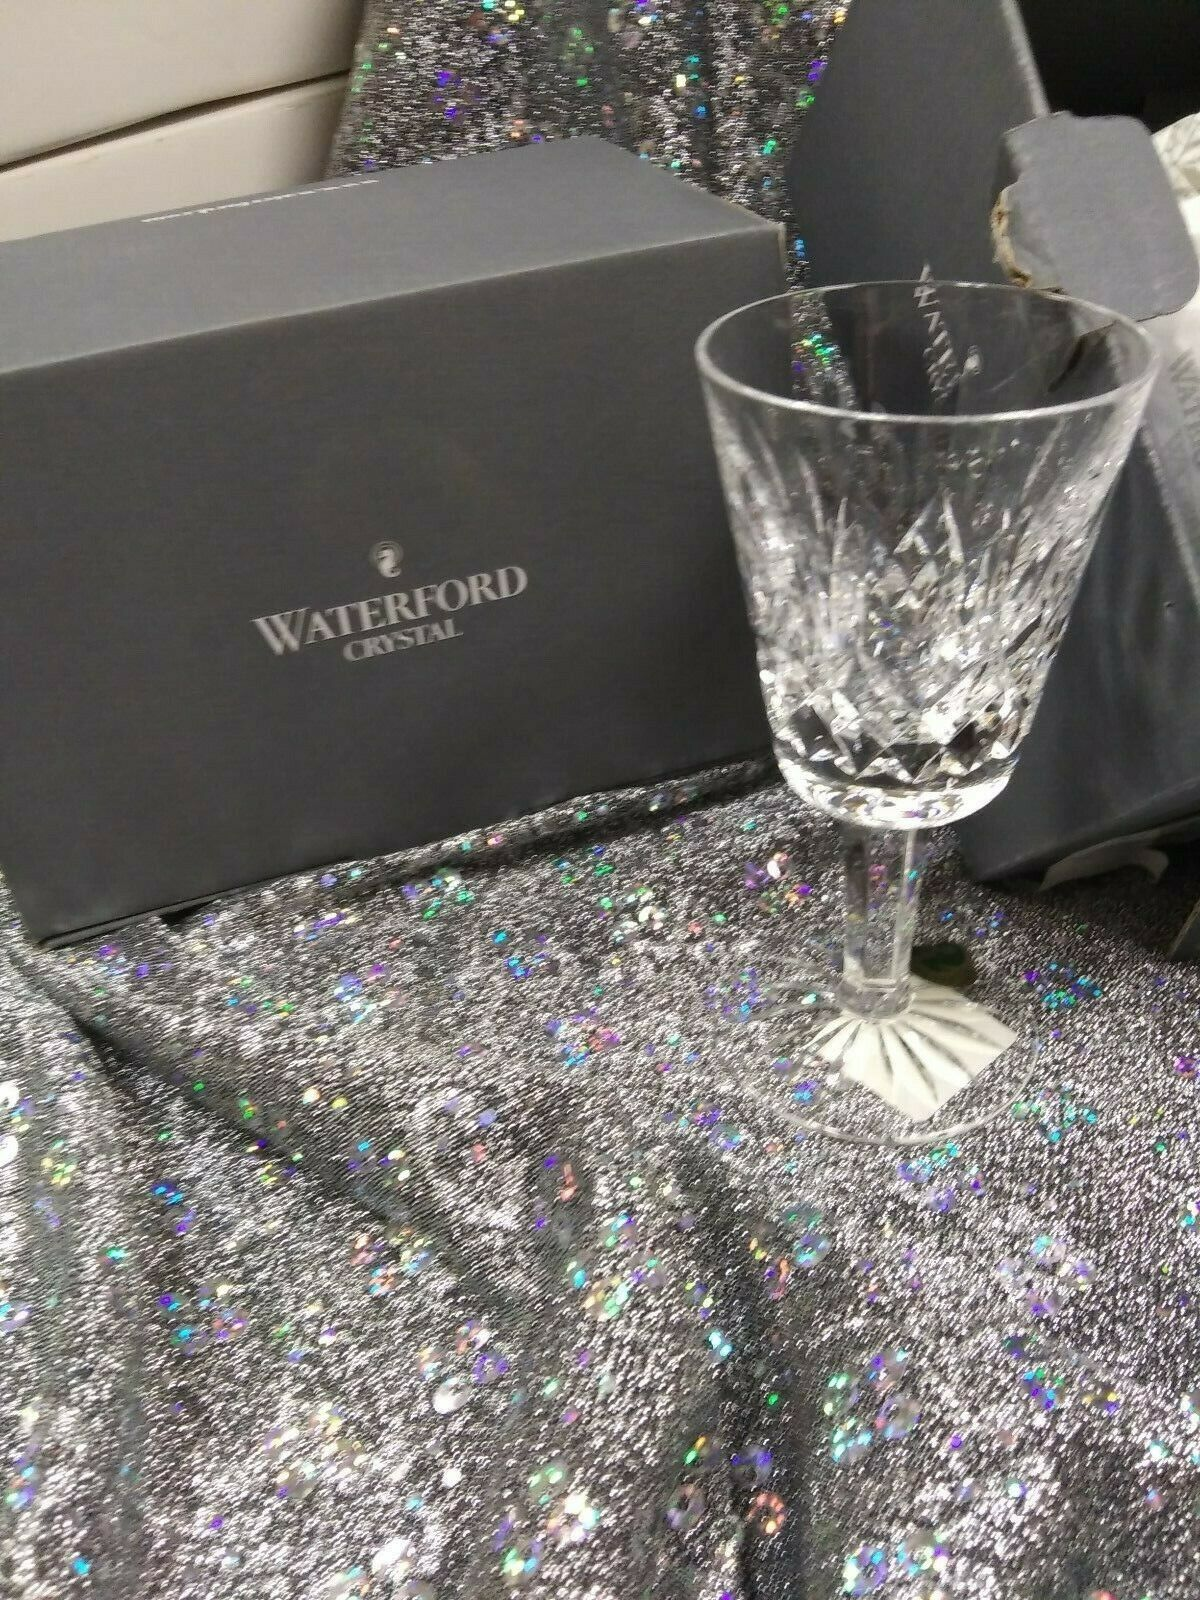 WATERFORD Lismore Vin Blanc Lot de 6 verres cristal 4 oz (environ 113.40 g)